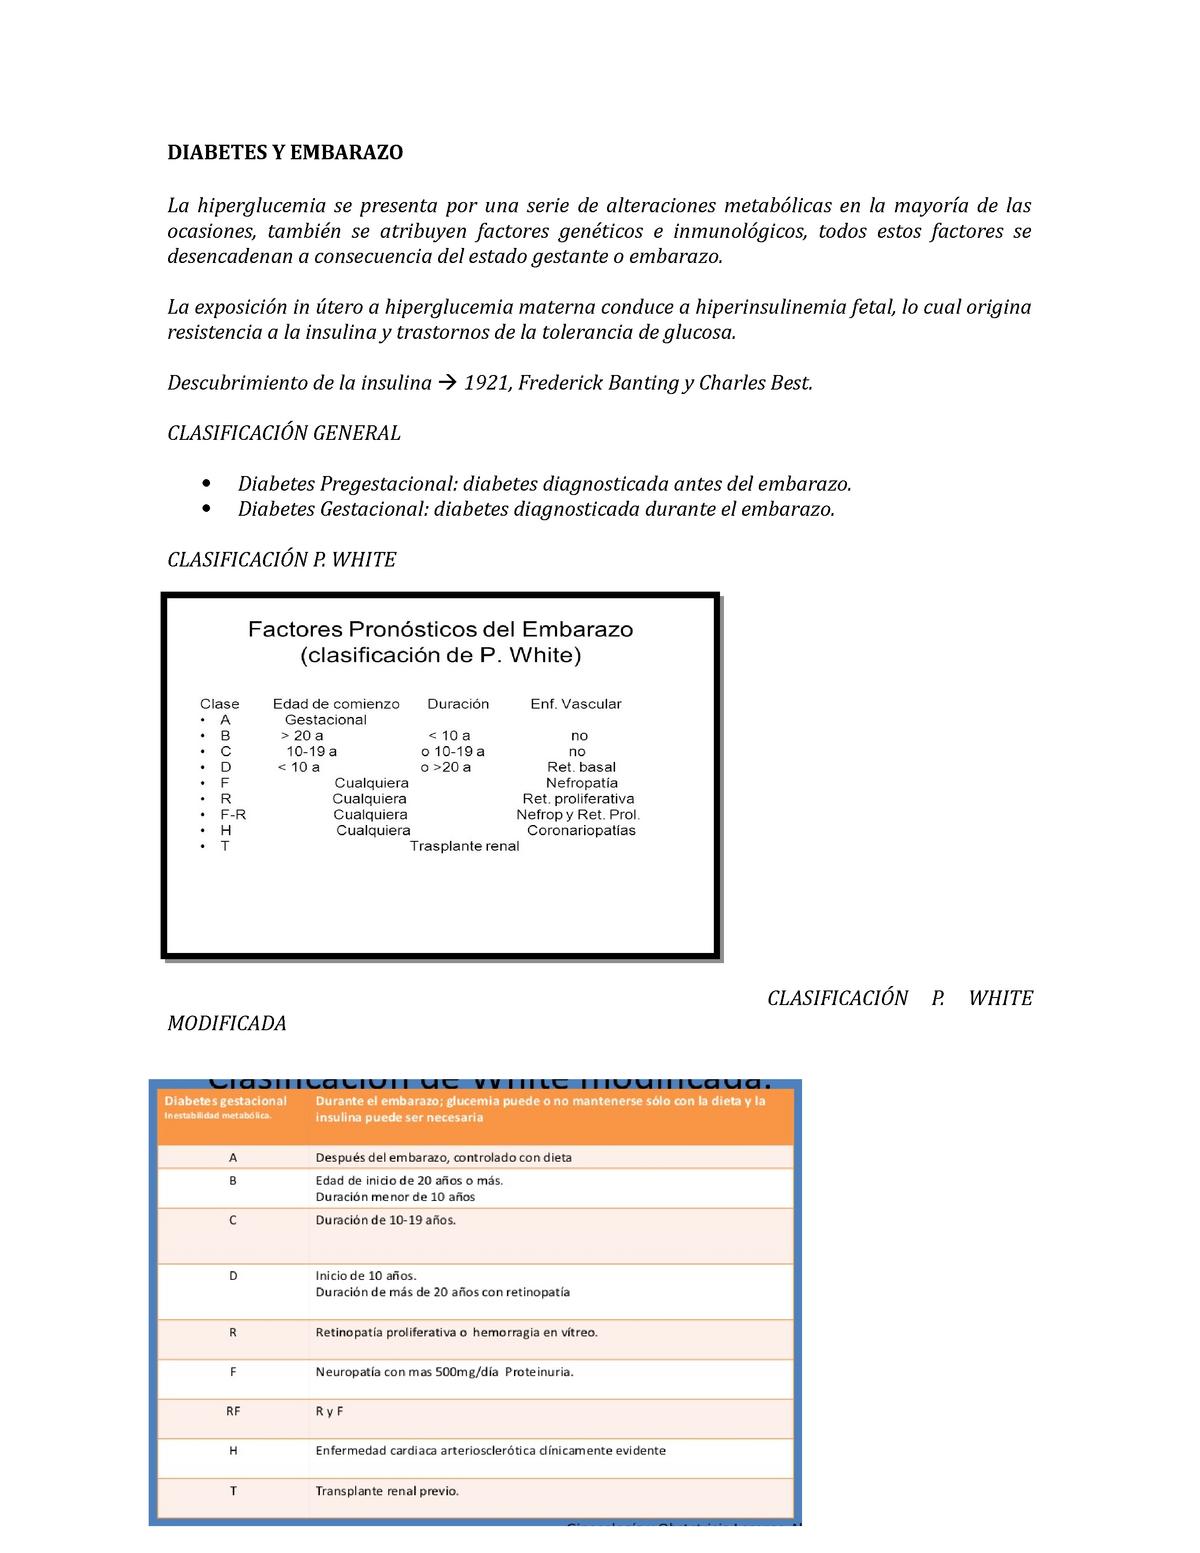 deterioro placentario diabetes gestacional